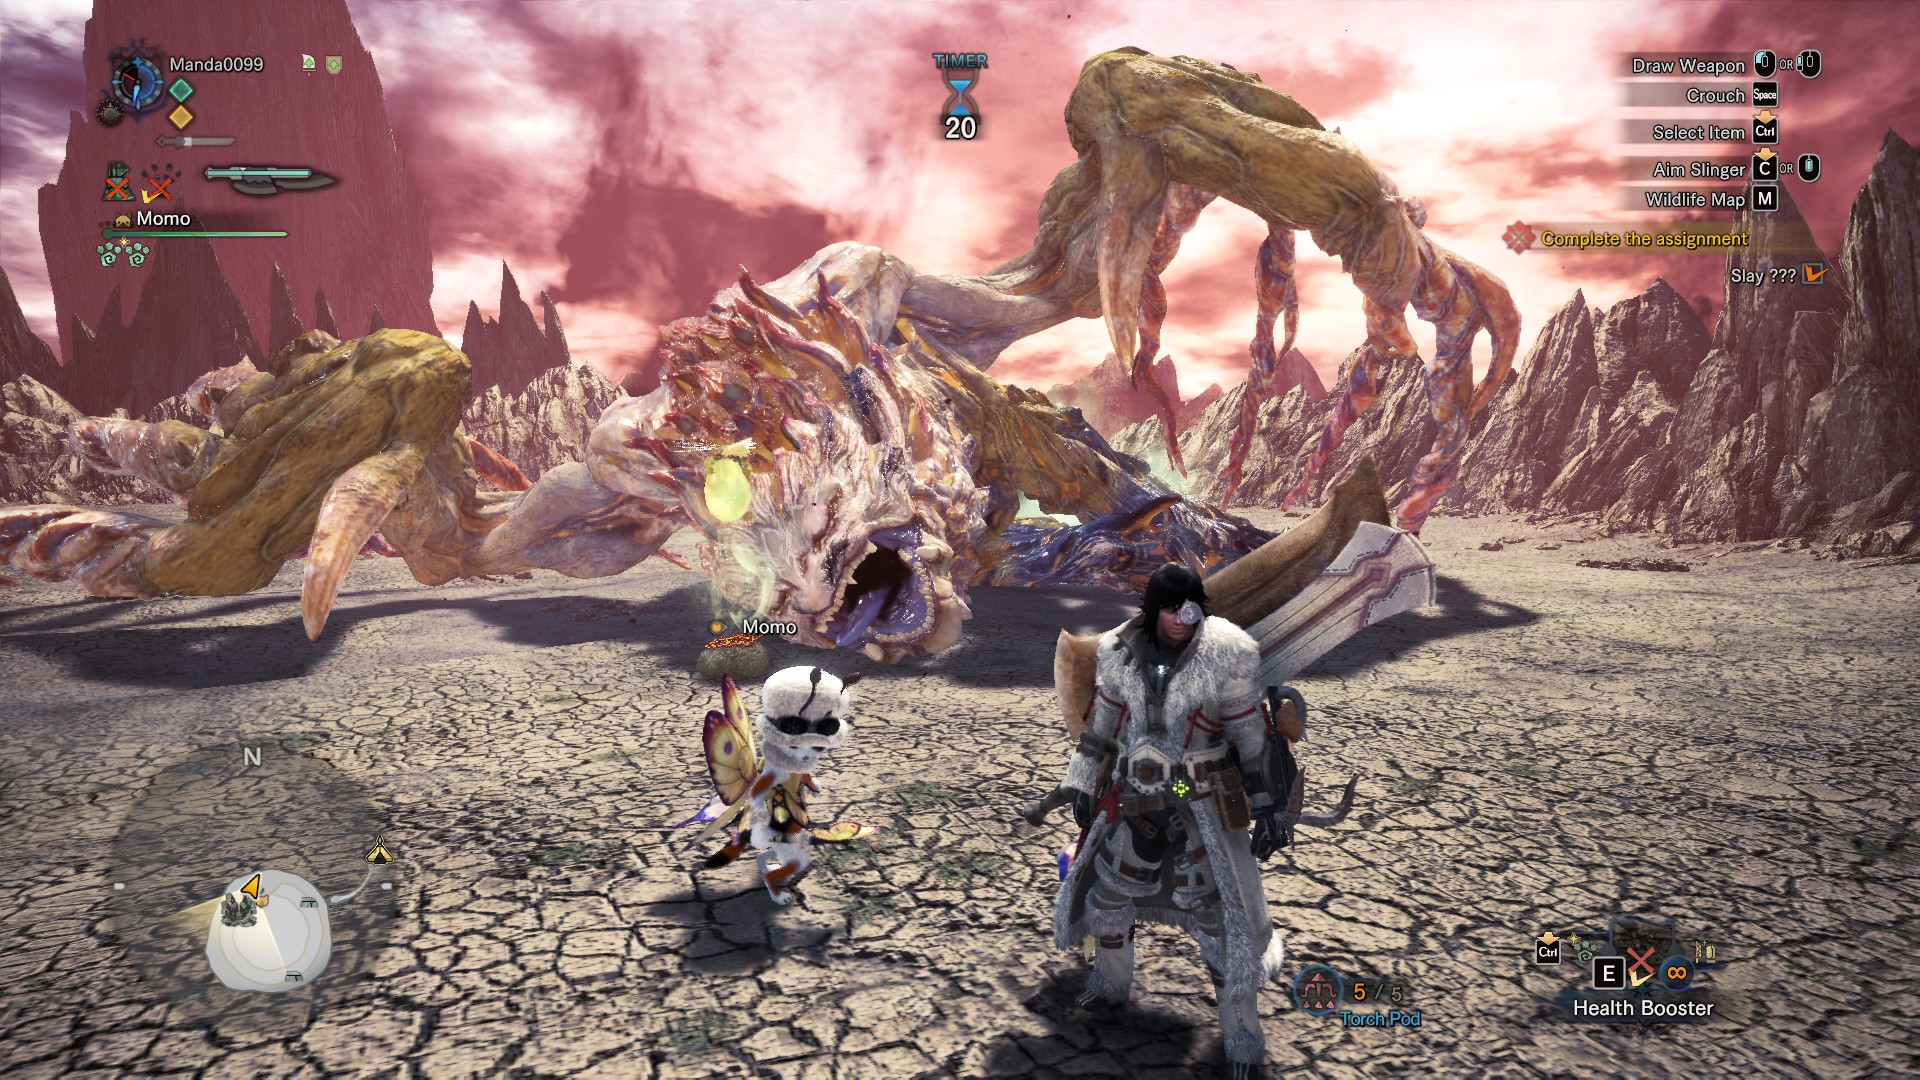 Monster Hunter: World - Tips How to Defeat Shara Ishvalda - Some tips to fight Shara Ishvalda... - B99BF00